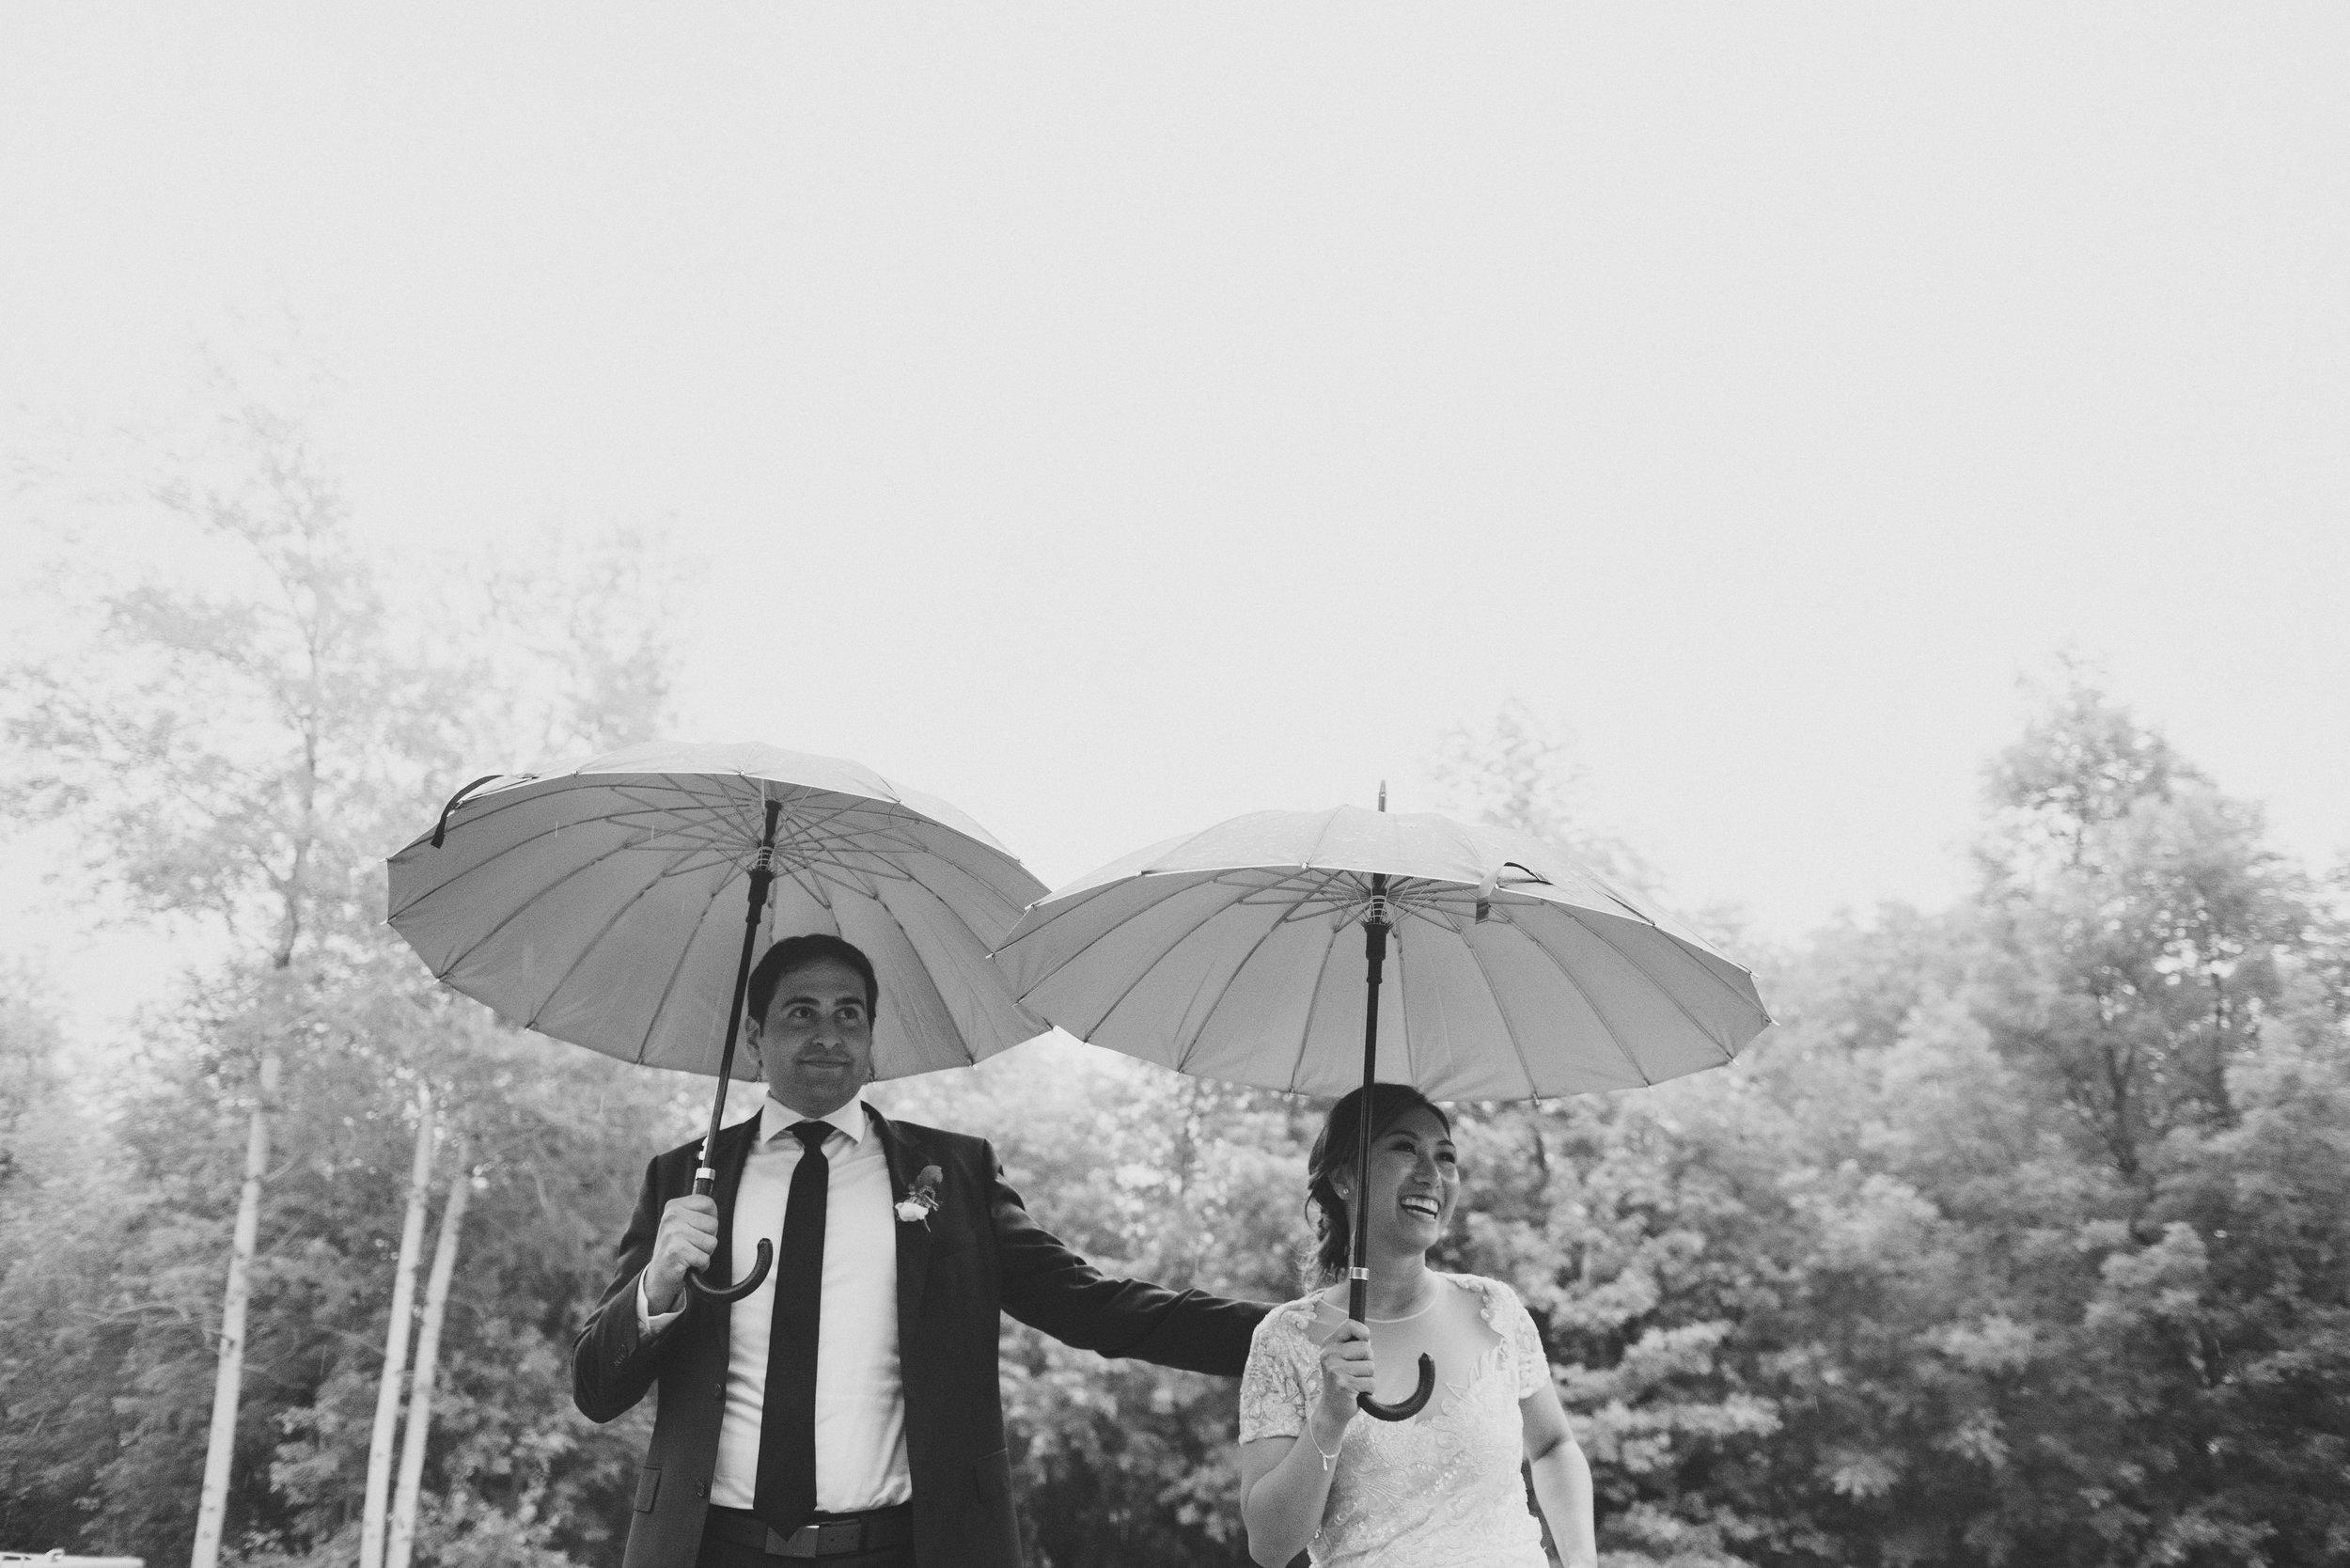 LVImagery-WeddingBells-DianaSohrab-46.JPG